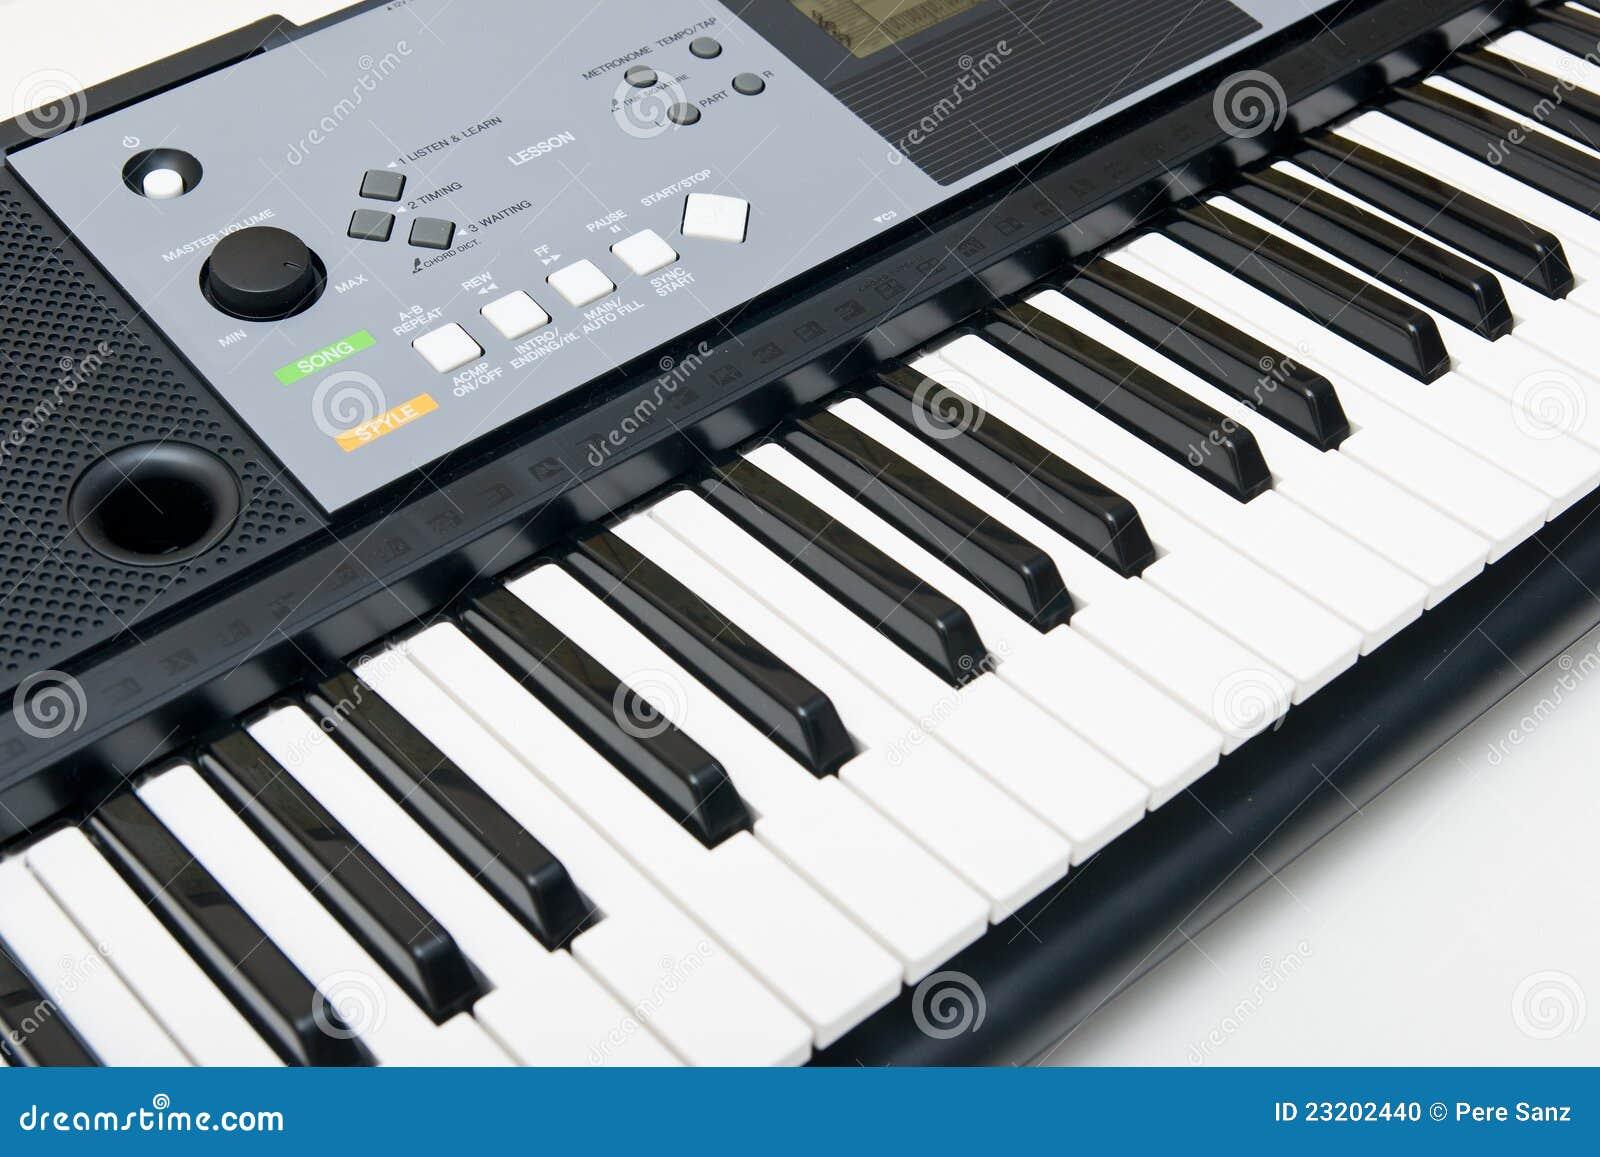 Electronic keyboard no sound 2014